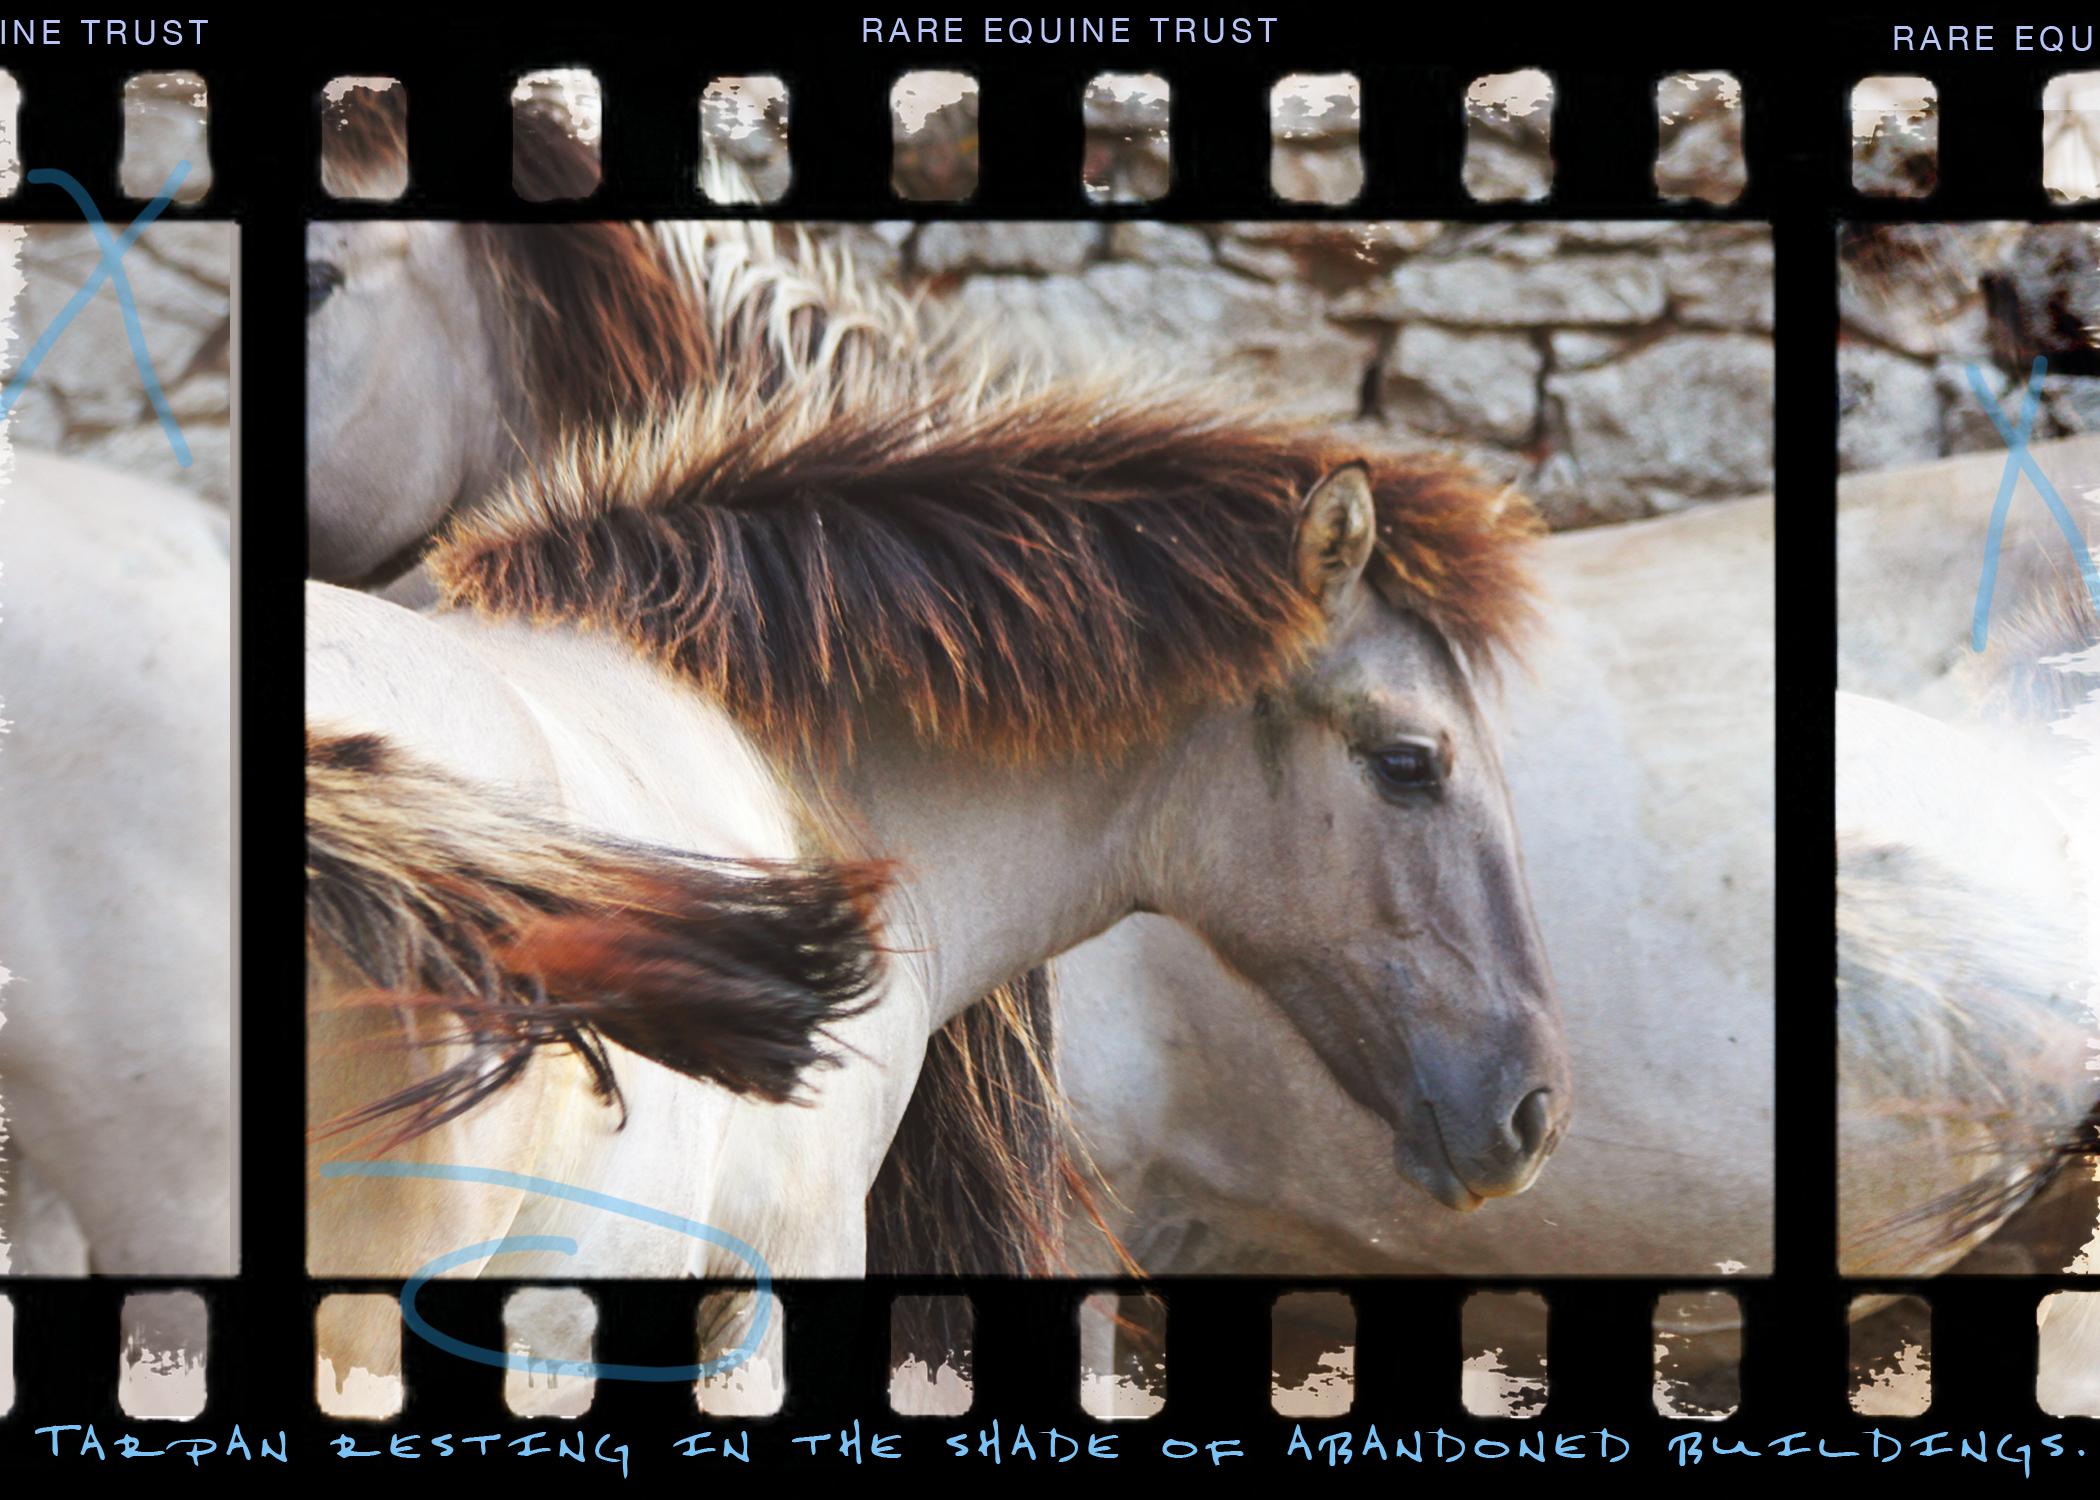 Tarpan web gallery2.jpg